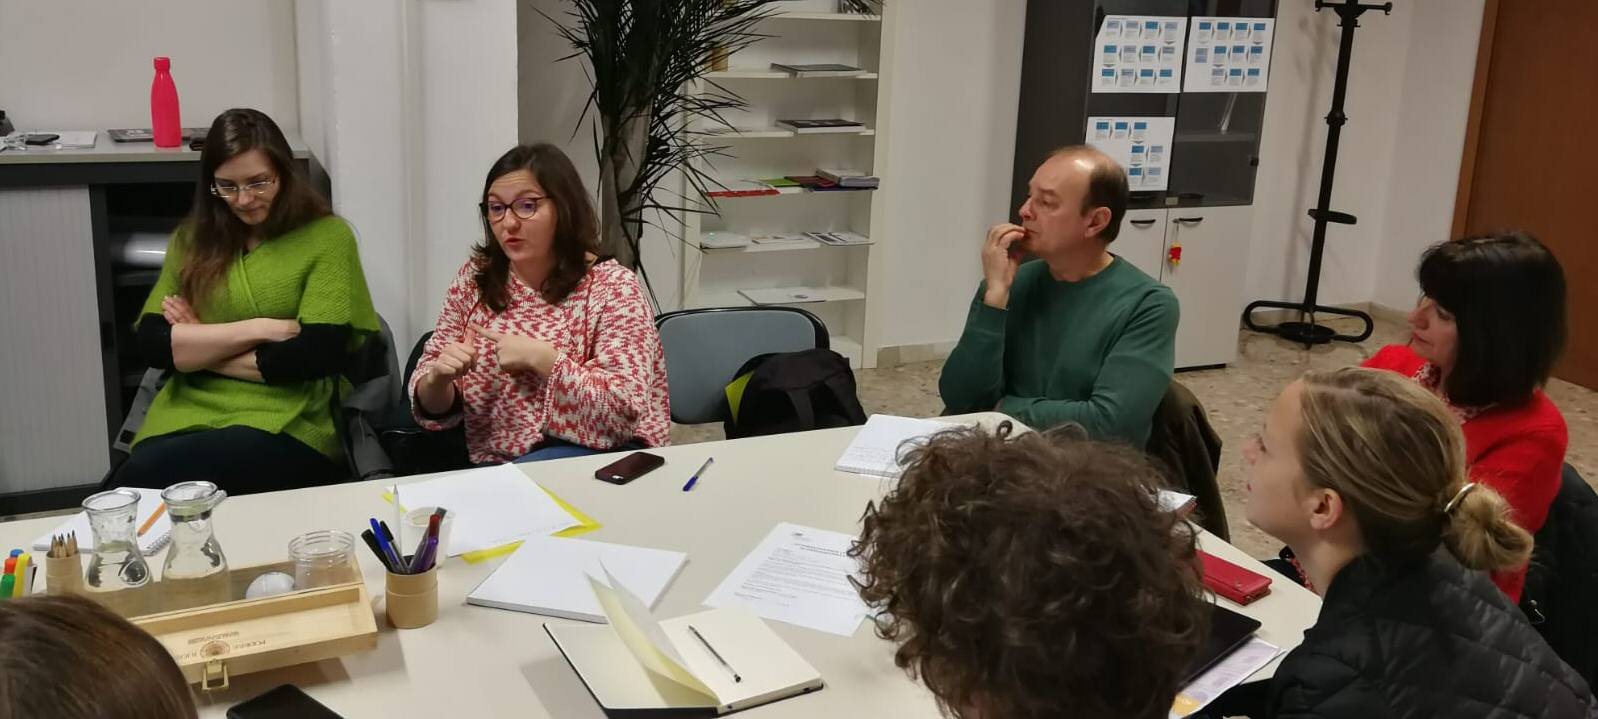 La Fédération des acteurs de la solidarité in visita negli spazi di Insieme per il lavoro